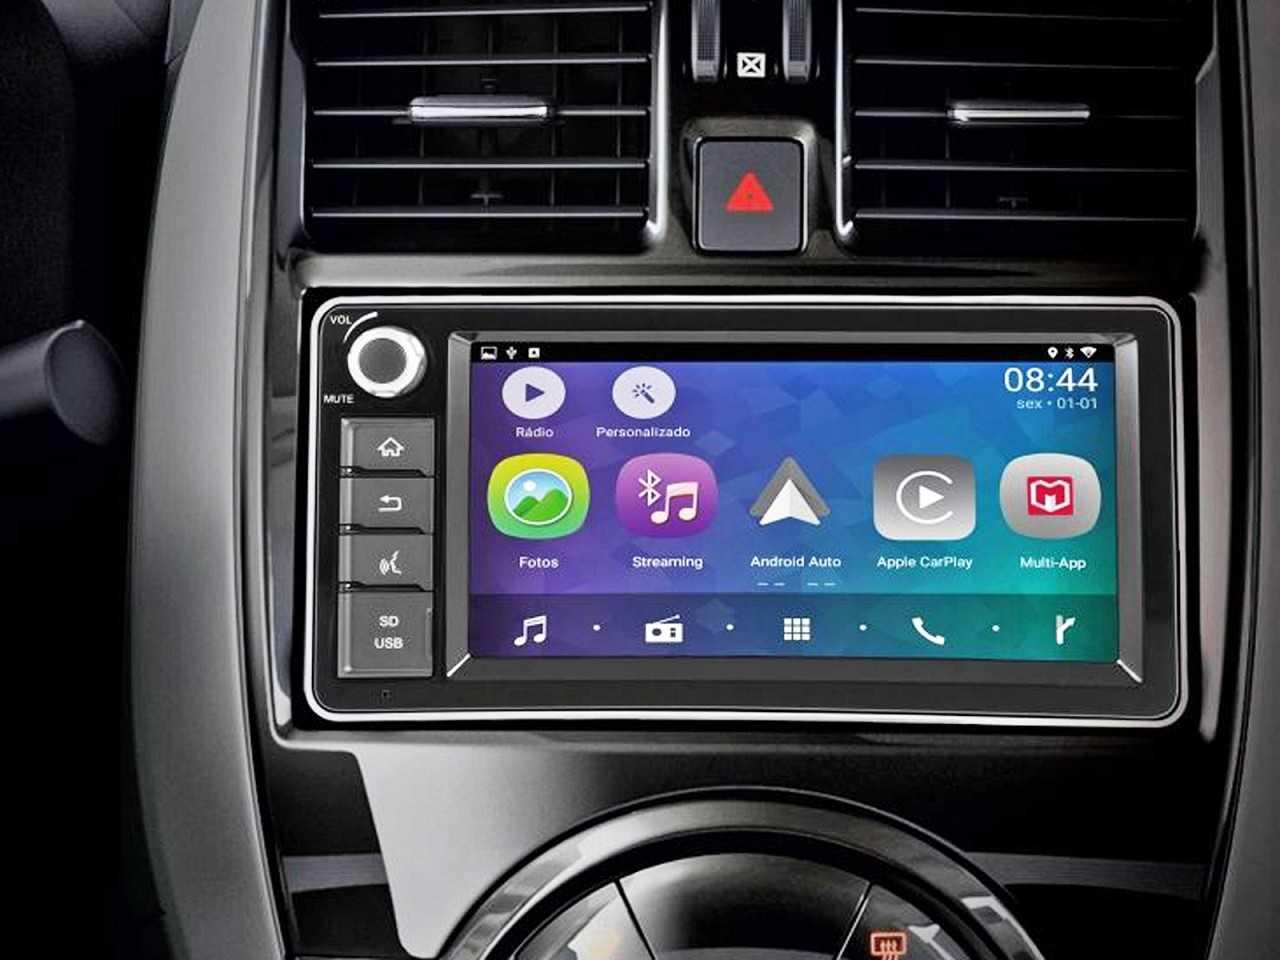 Central multimídia da Nissan: recurso está cada vez mais popular entre os carros de entrada